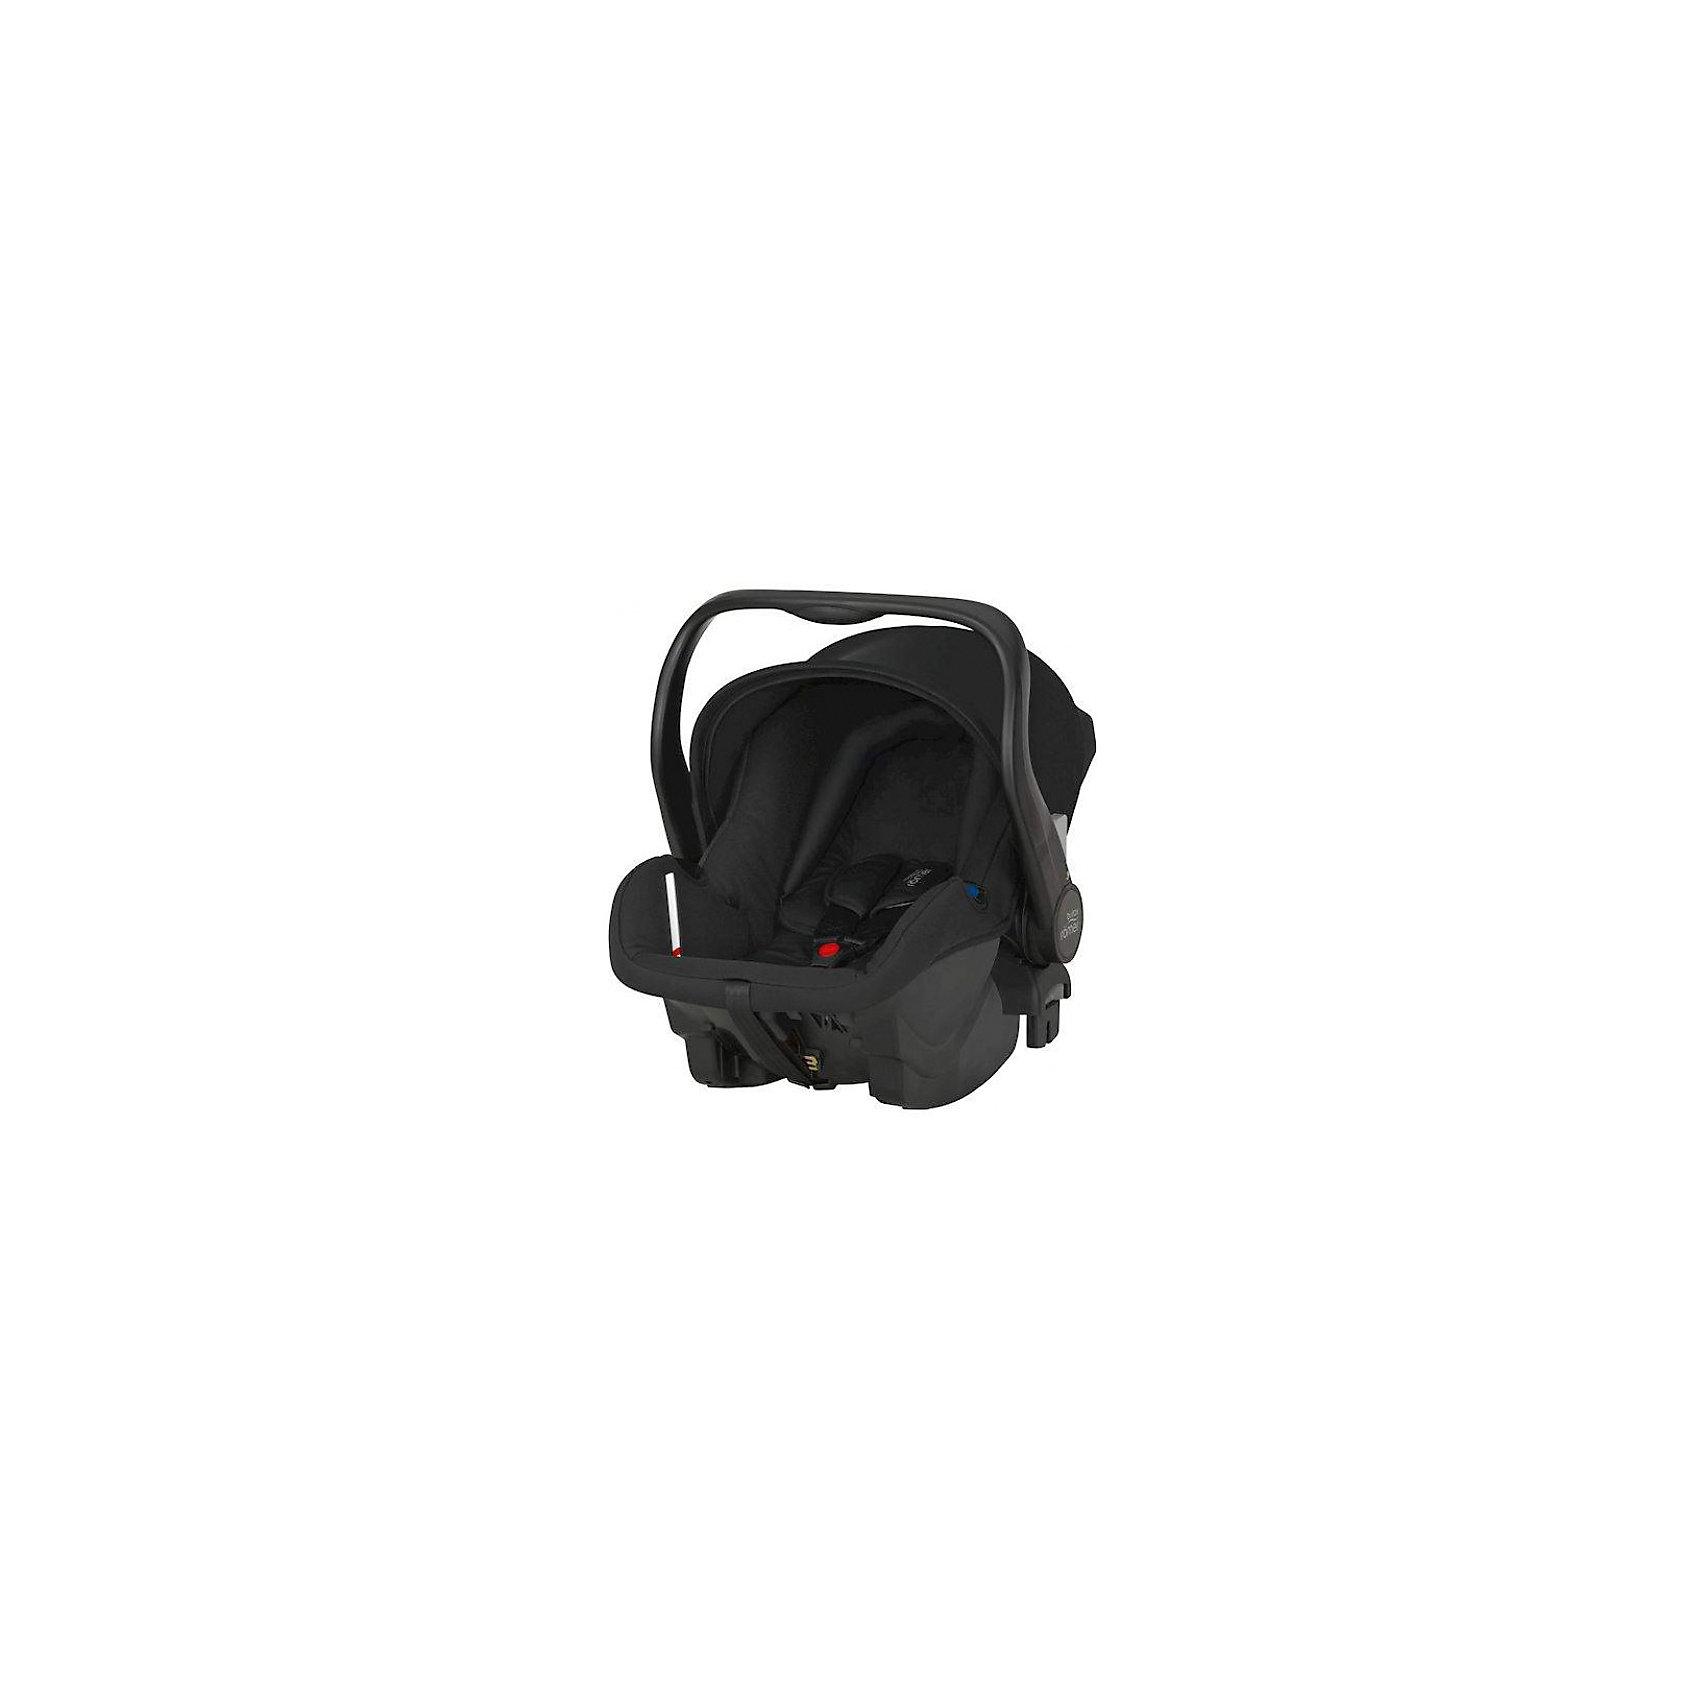 Britax Автокресло PRIMO 0-13 кг., Britax Römer, Cosmos Black поводок безопасности для ребенка